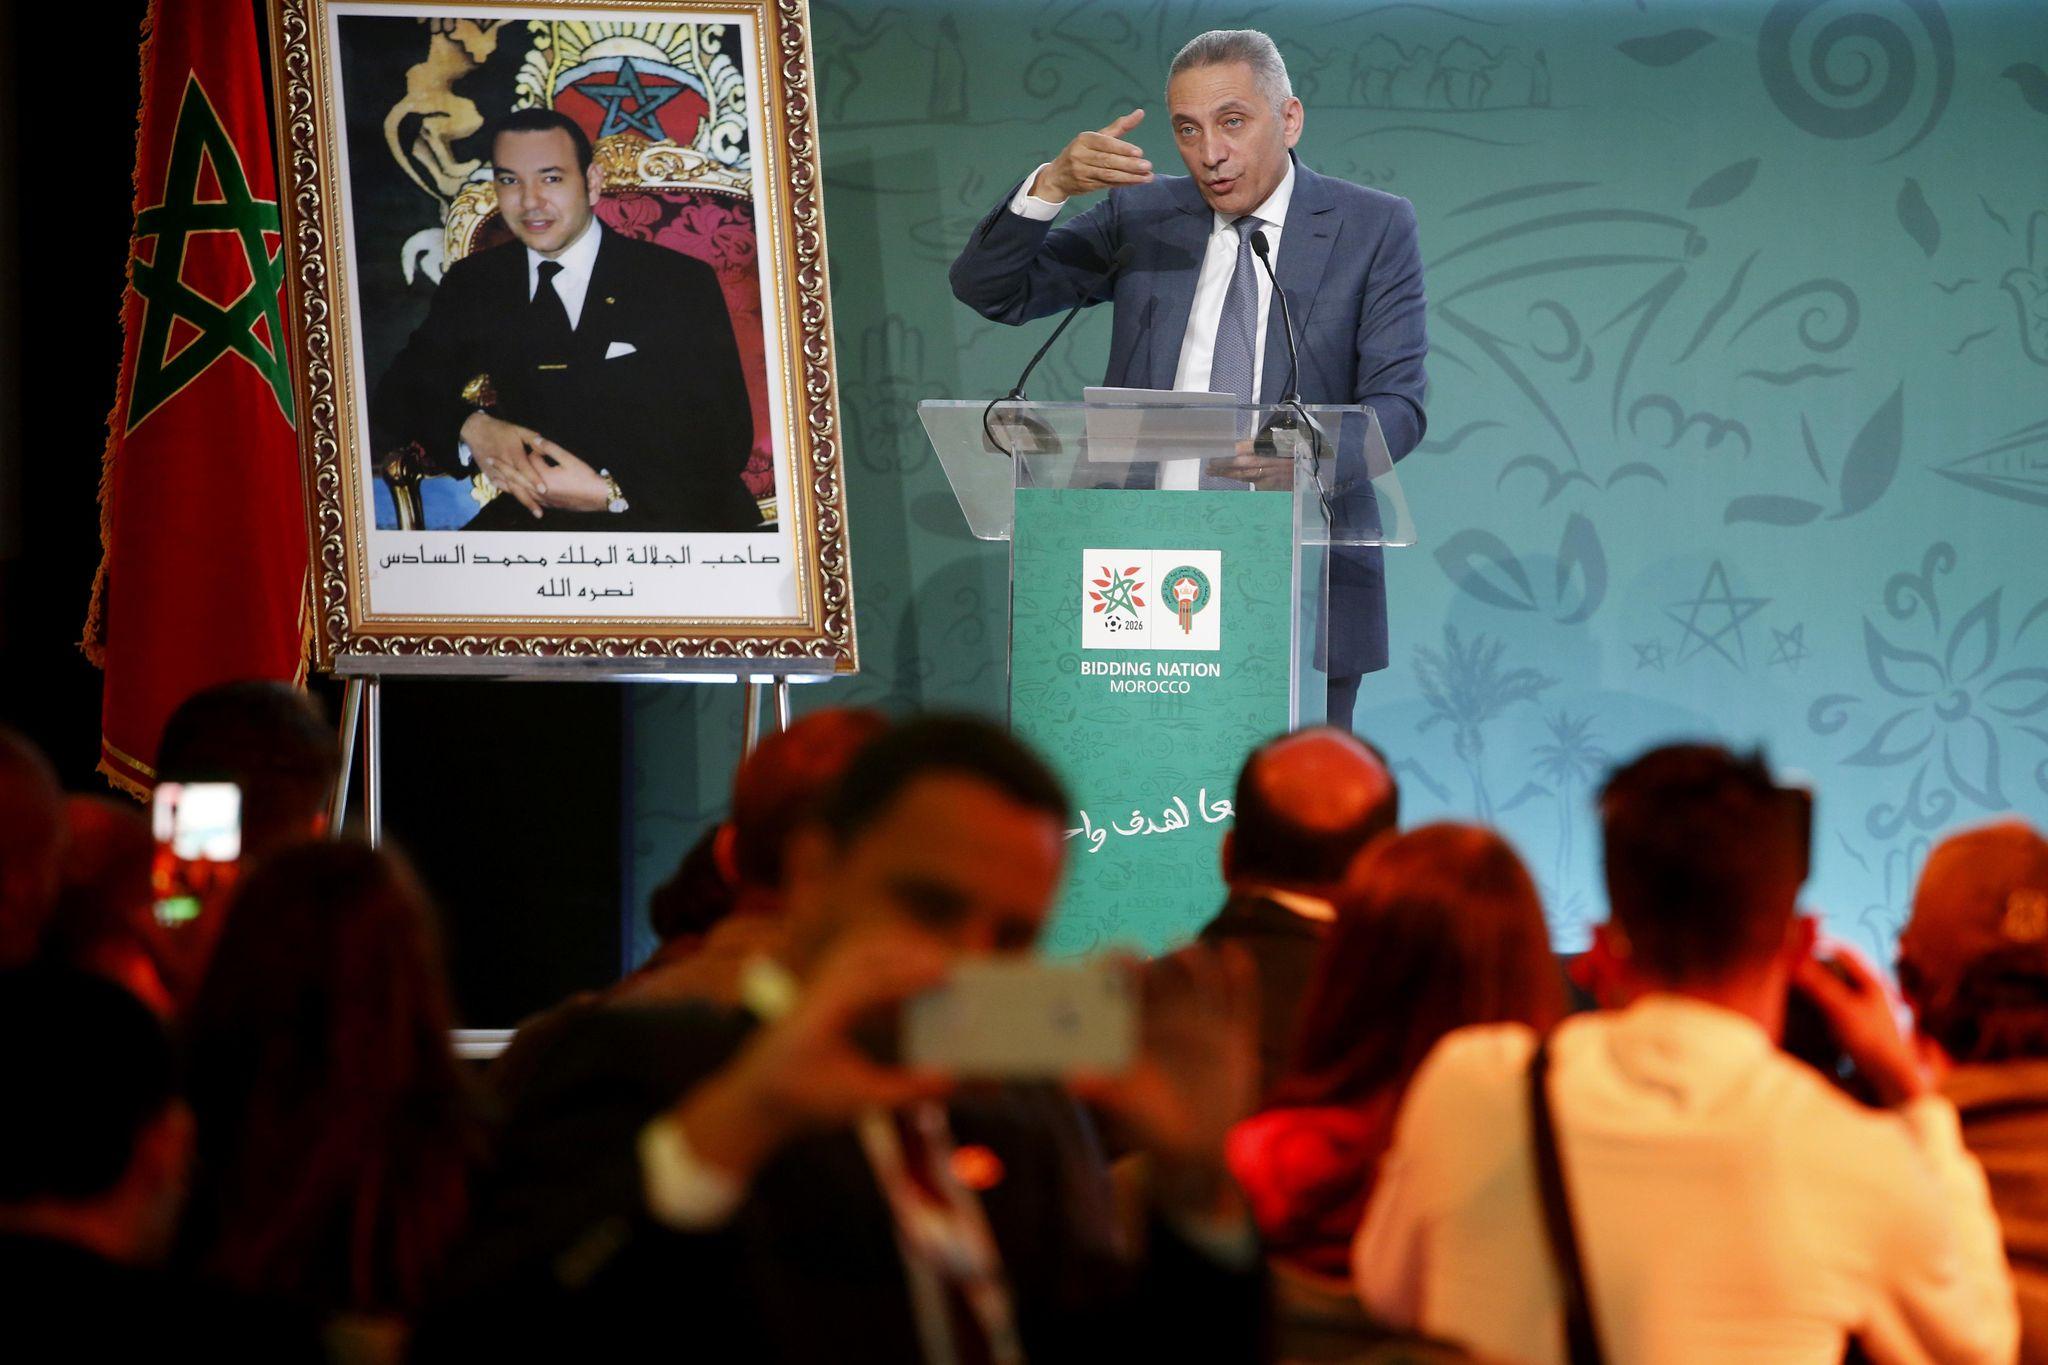 Morocco_soccer_2026_world_cup_bid_05447_s2048x1365